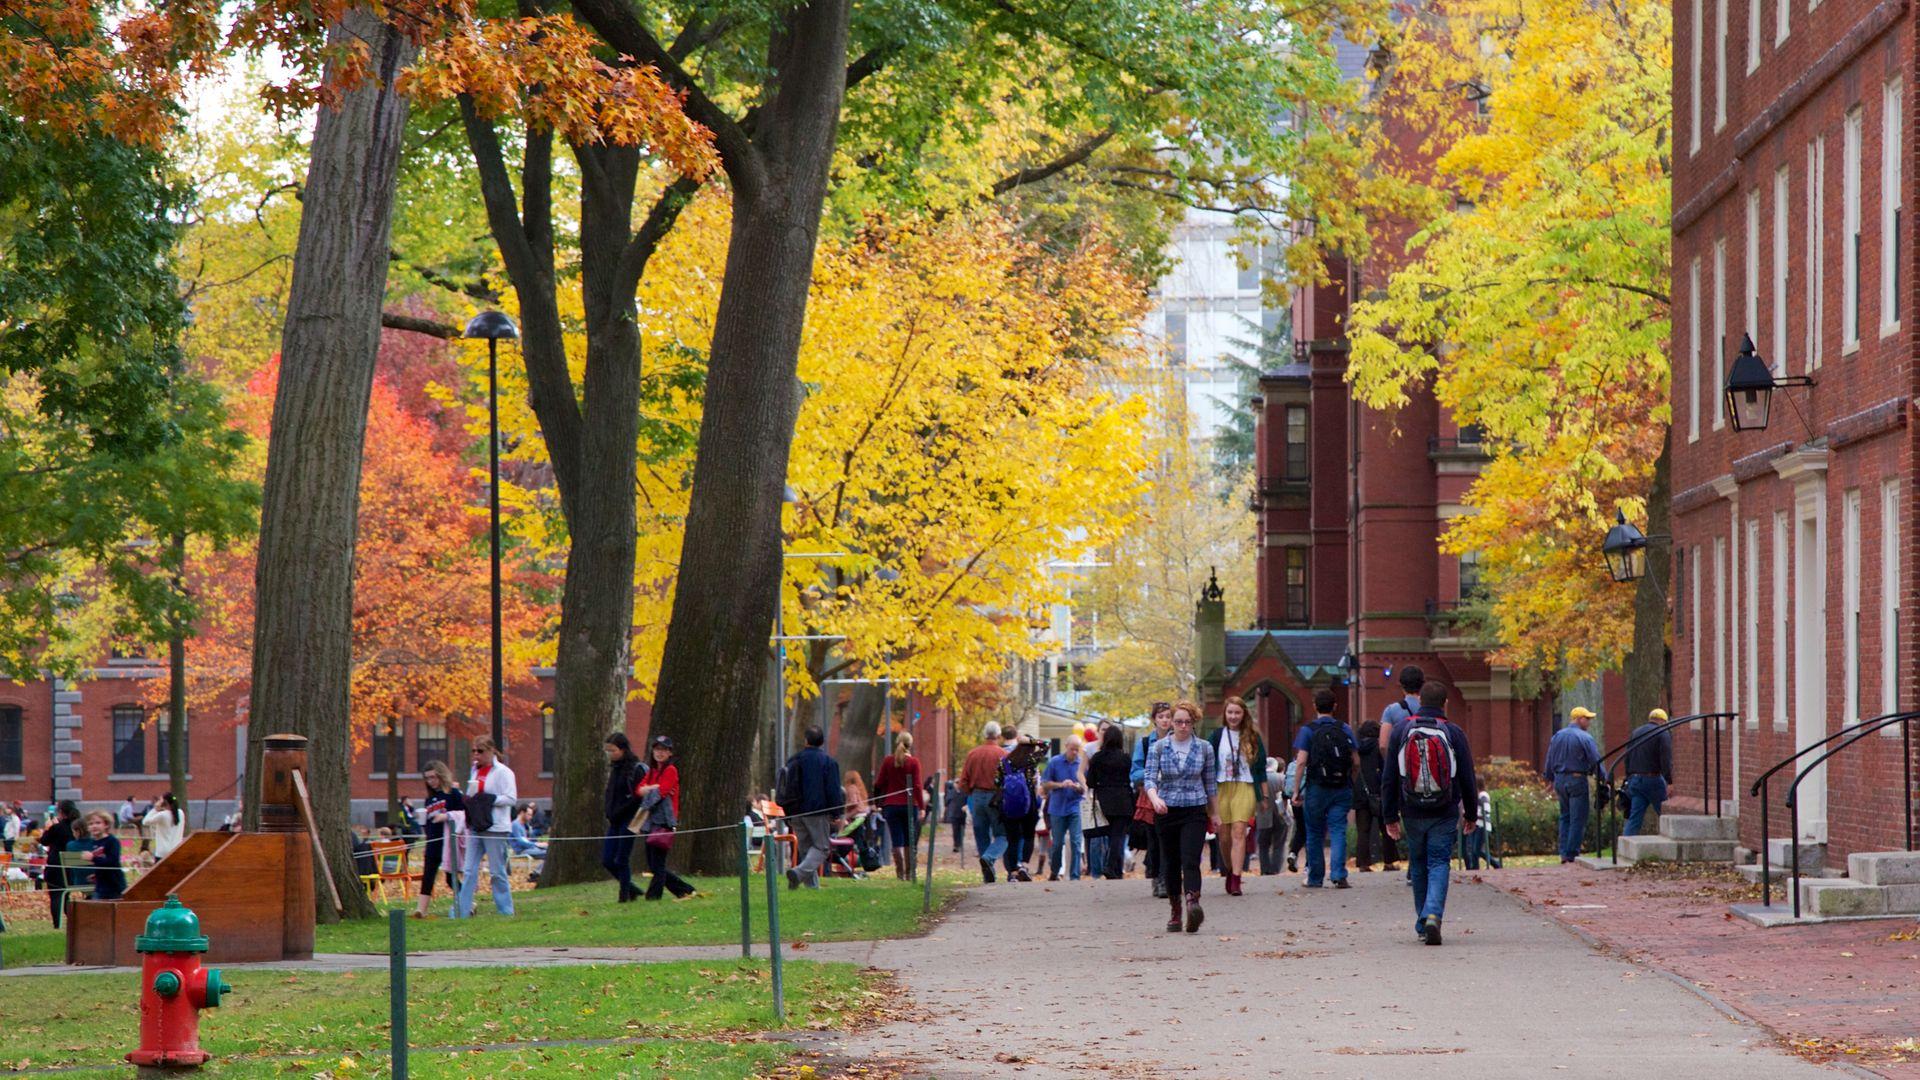 Harvard Yard, old heart of Harvard University campus.